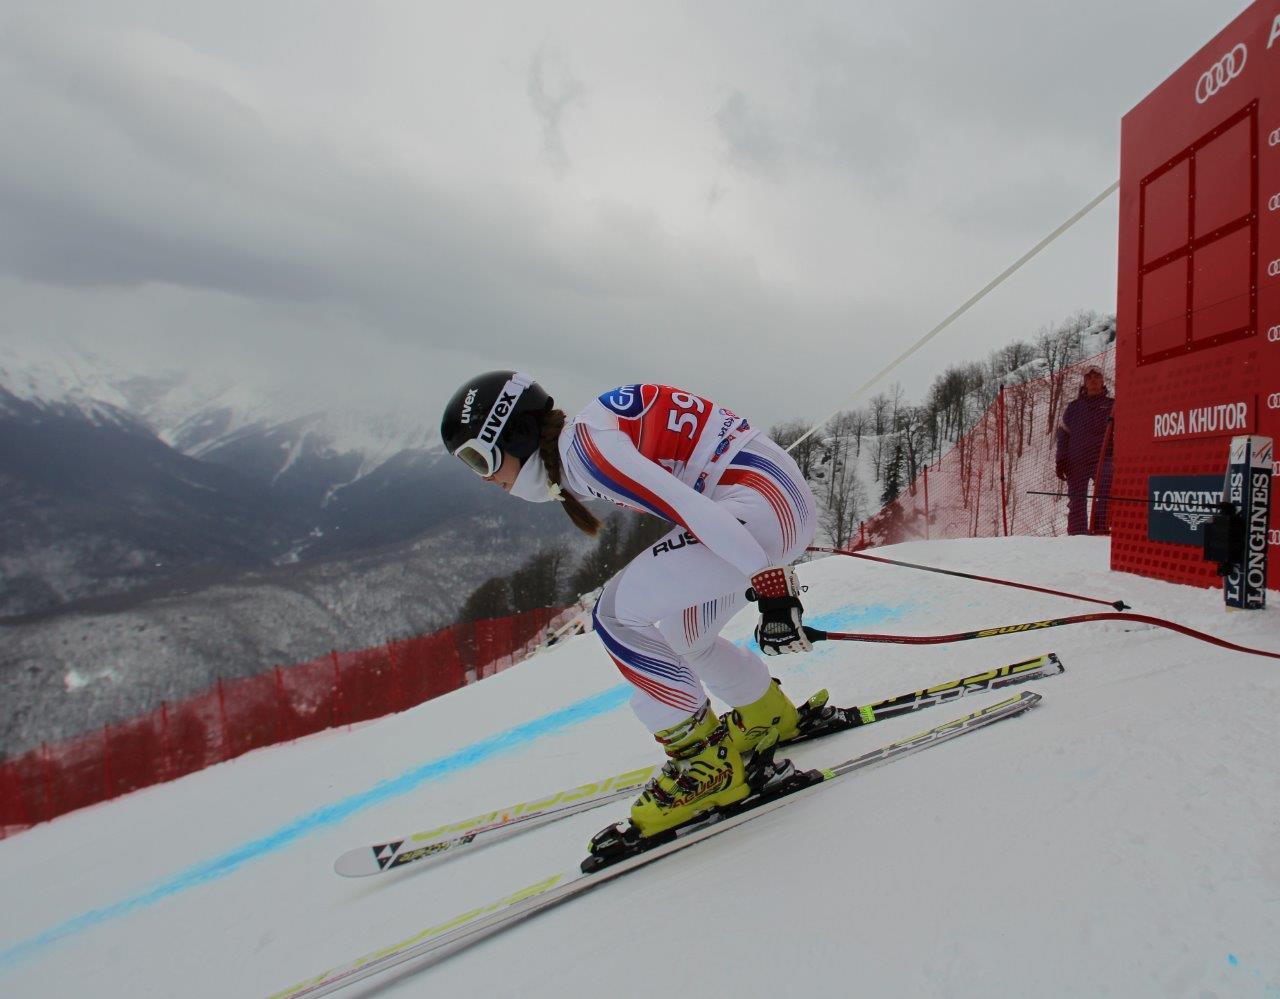 Rosa Ski Dream 1-2 Февраля 2020 Роза Хутор Кубок Мира Сочи